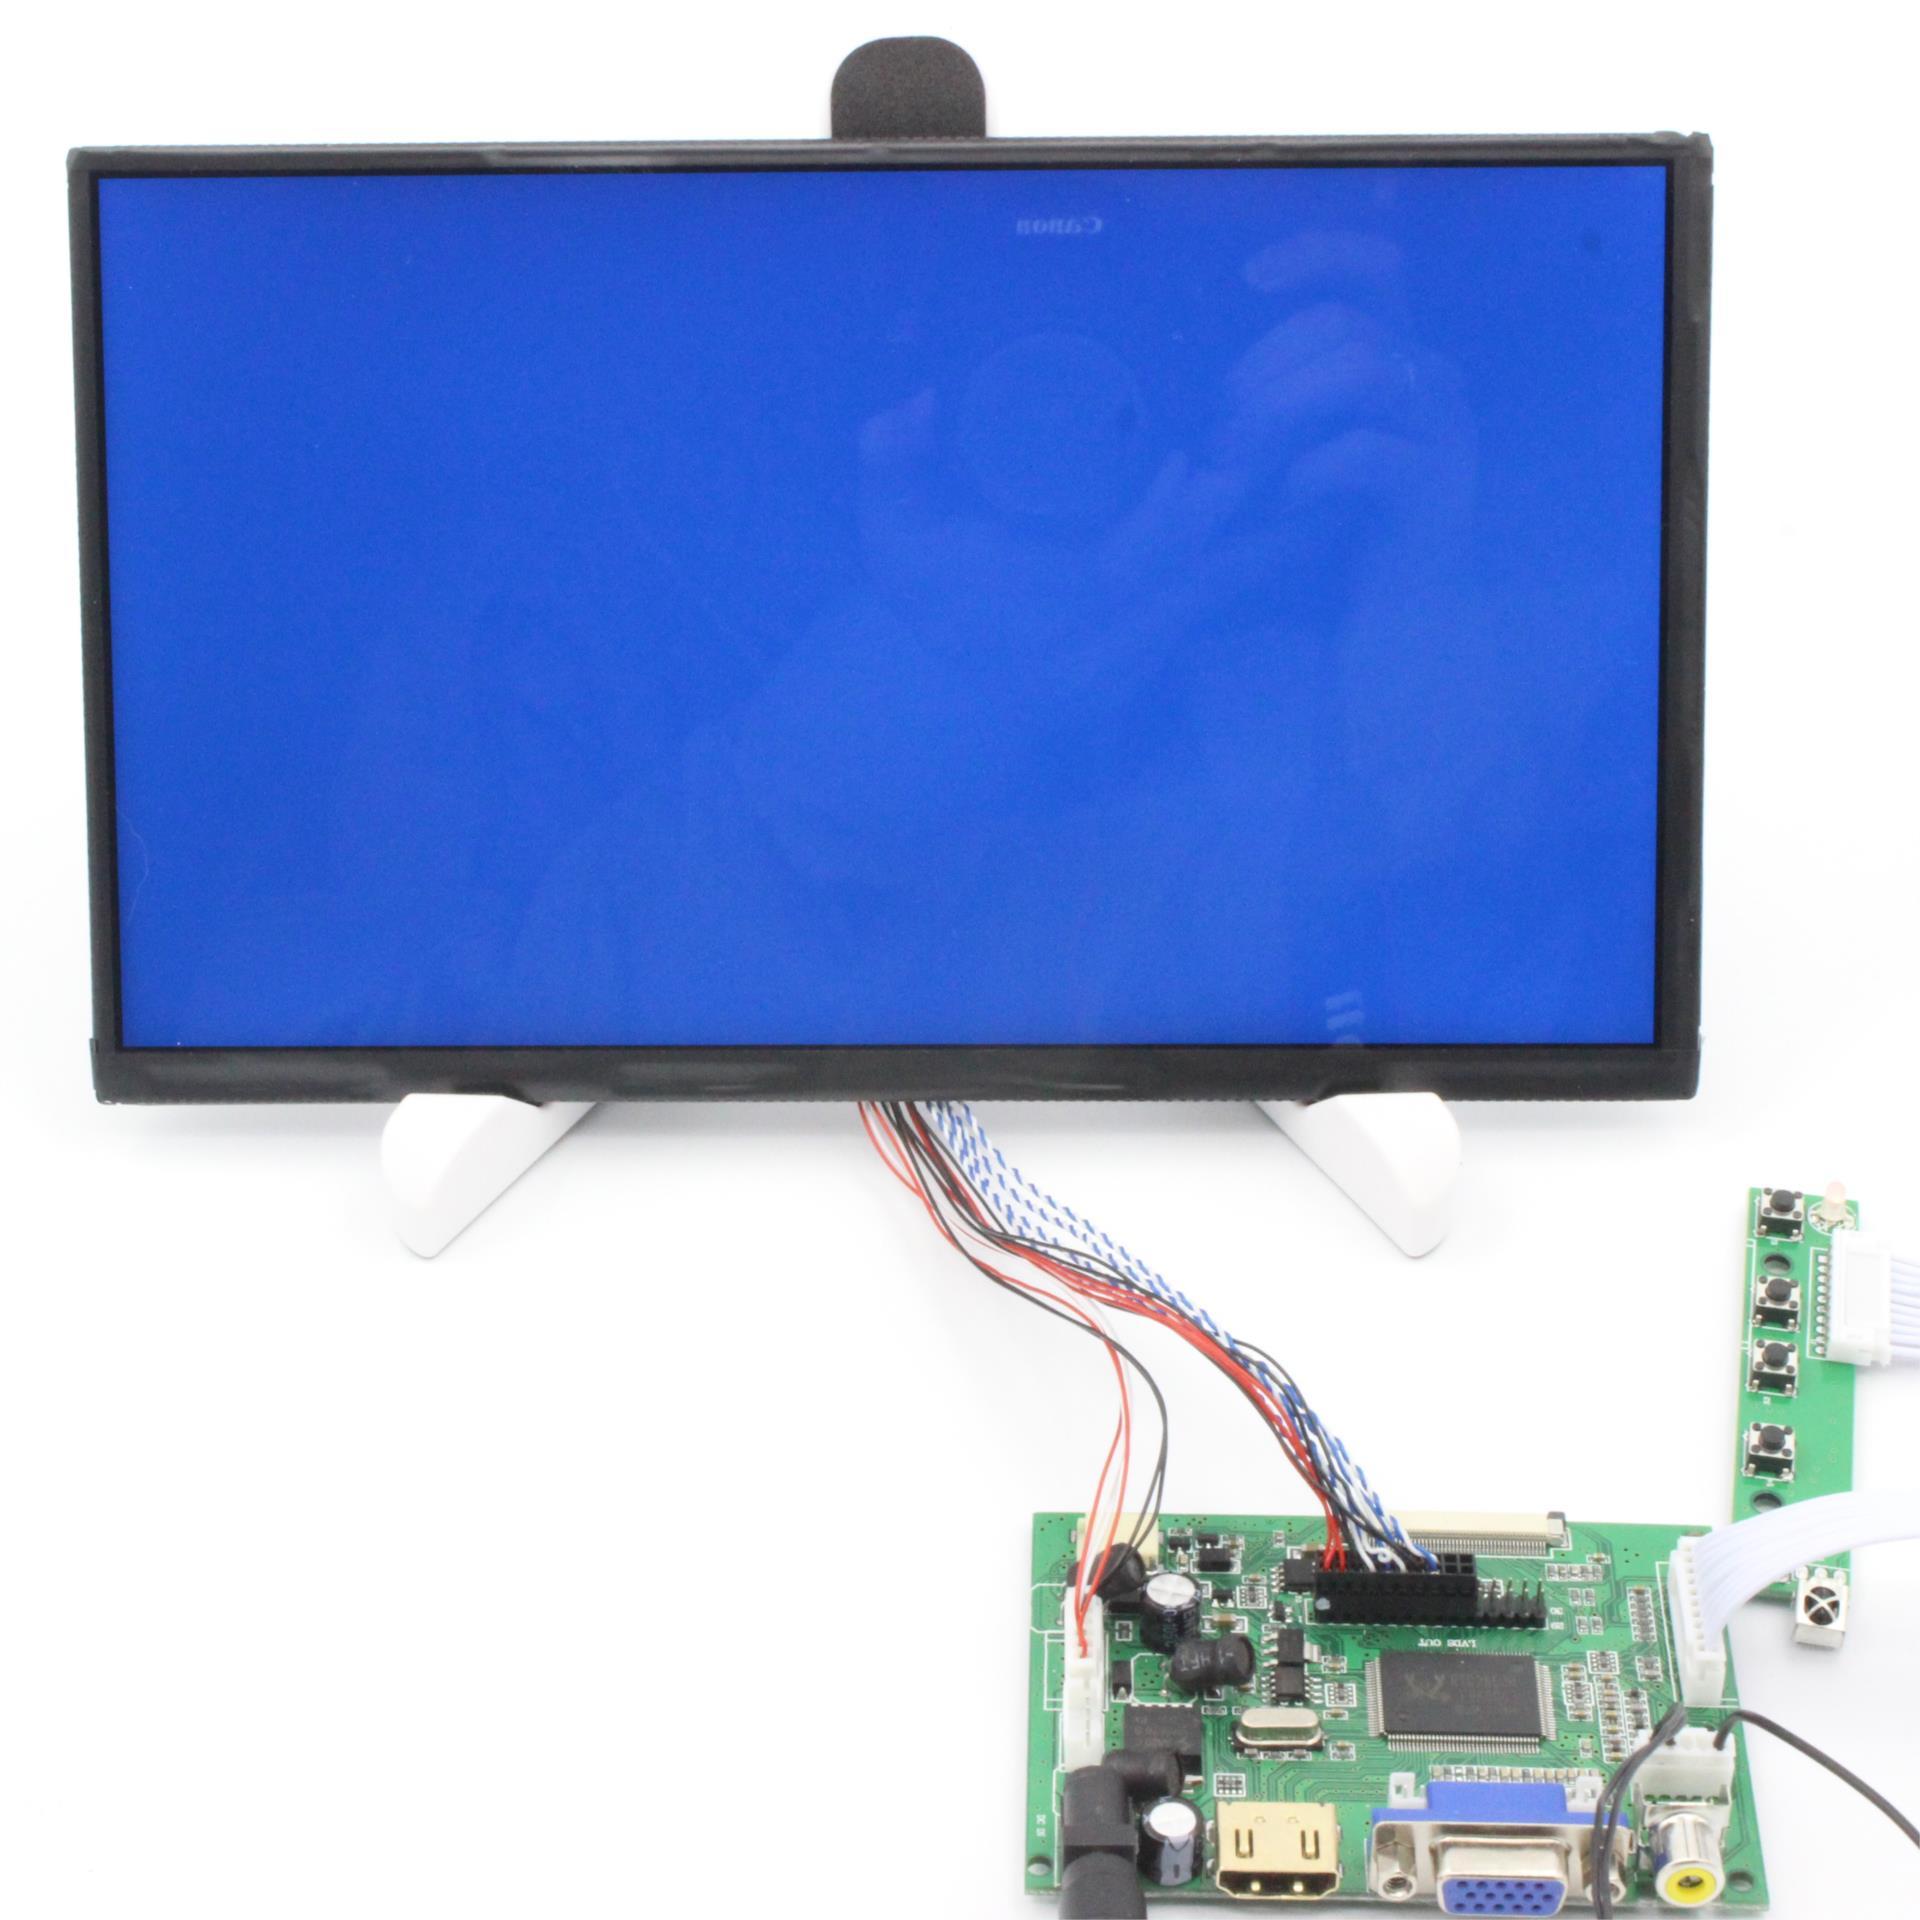 10.1 Inch 1024*600 Screen HD Digital LCD Module Monitor Display Backing Car HDMI VGA AV Raspberry Pi 3 Banana Pi 1024 DIY